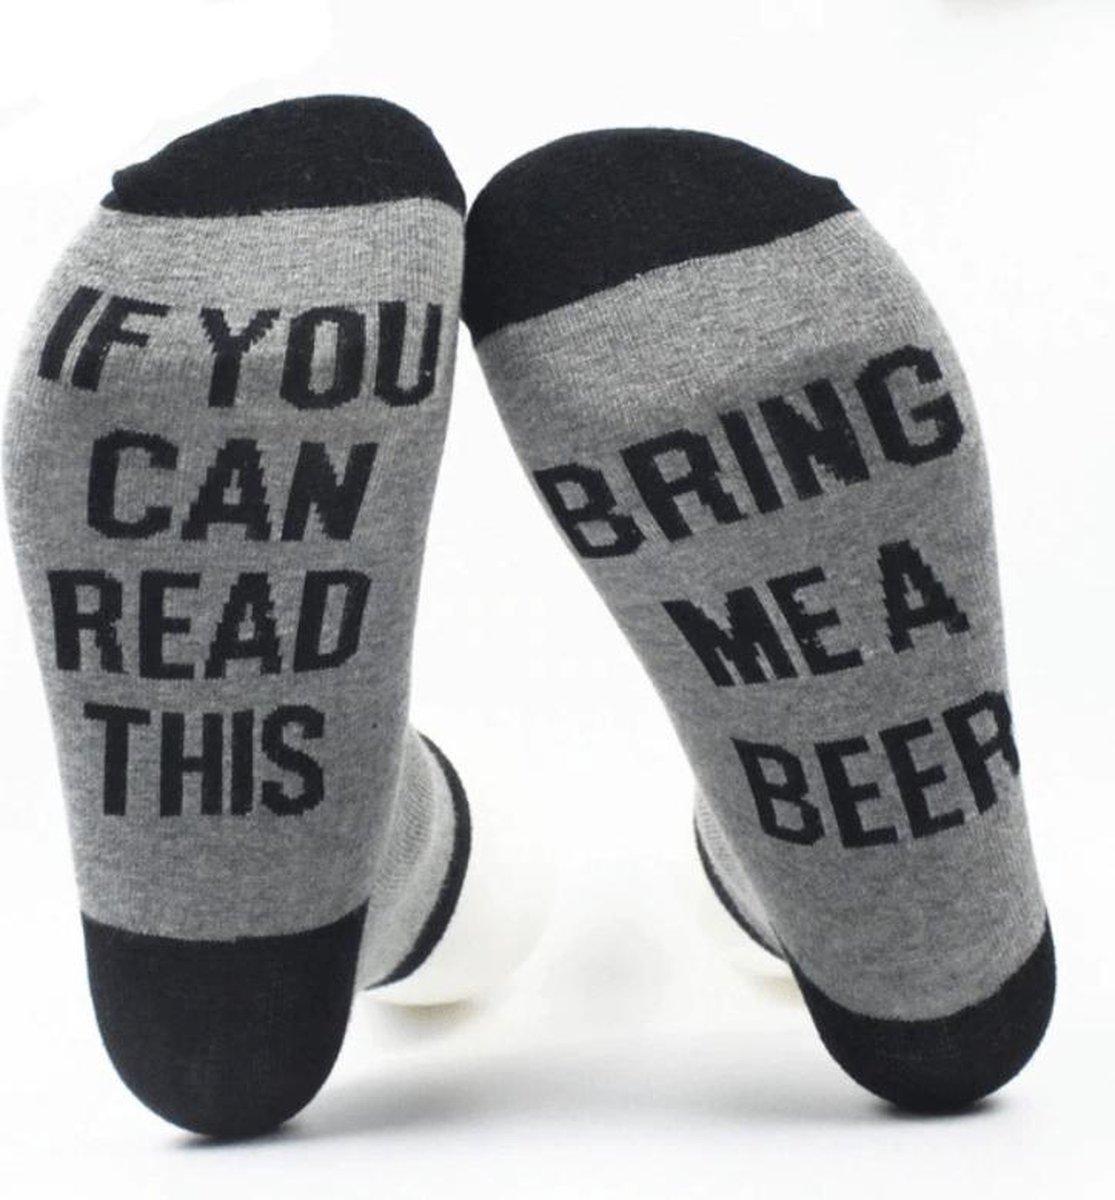 Grappige sokken - Bring me Beer - one size - cadeau mannen - huissokken - Vaderdag kados - verjaarda